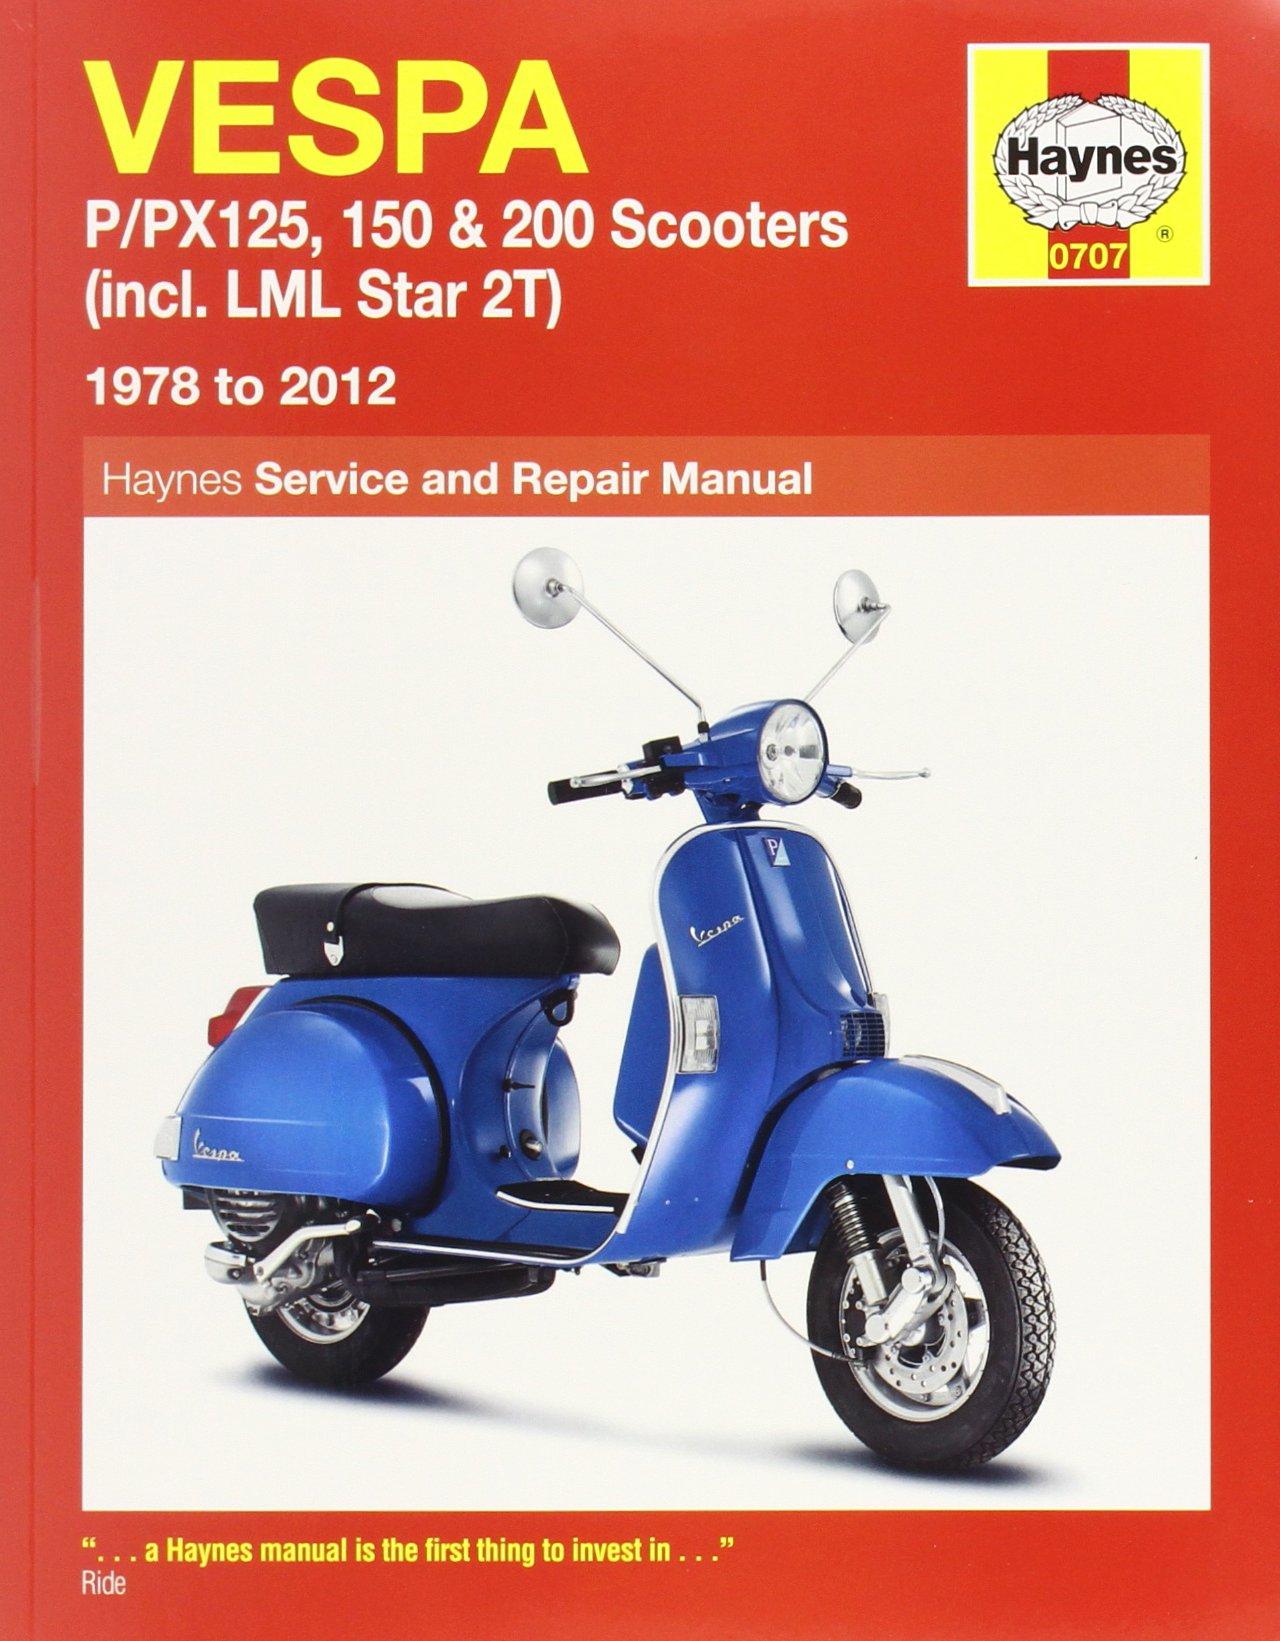 Vespa P/PX125, 150 & 200 Scooters Inc LML Star 2T Service & Repair Manual:  1978-2012 (Haynes Service and Repair Manuals): Amazon.co.uk: Pete Shoemark,  ...